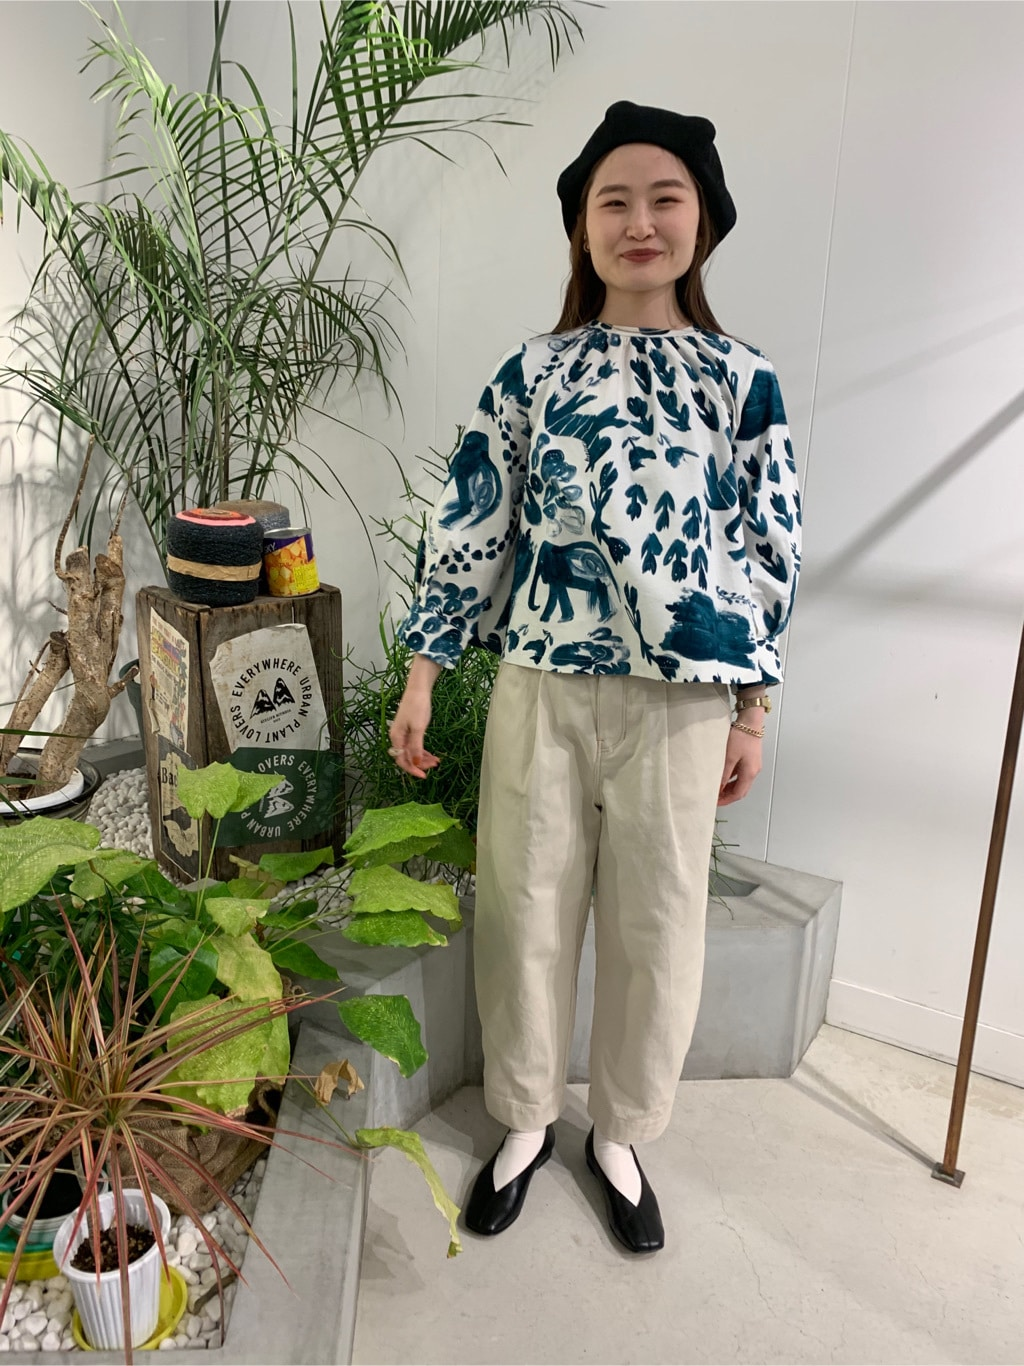 l'atelier du savon 名古屋栄路面 身長:159cm 2020.04.11